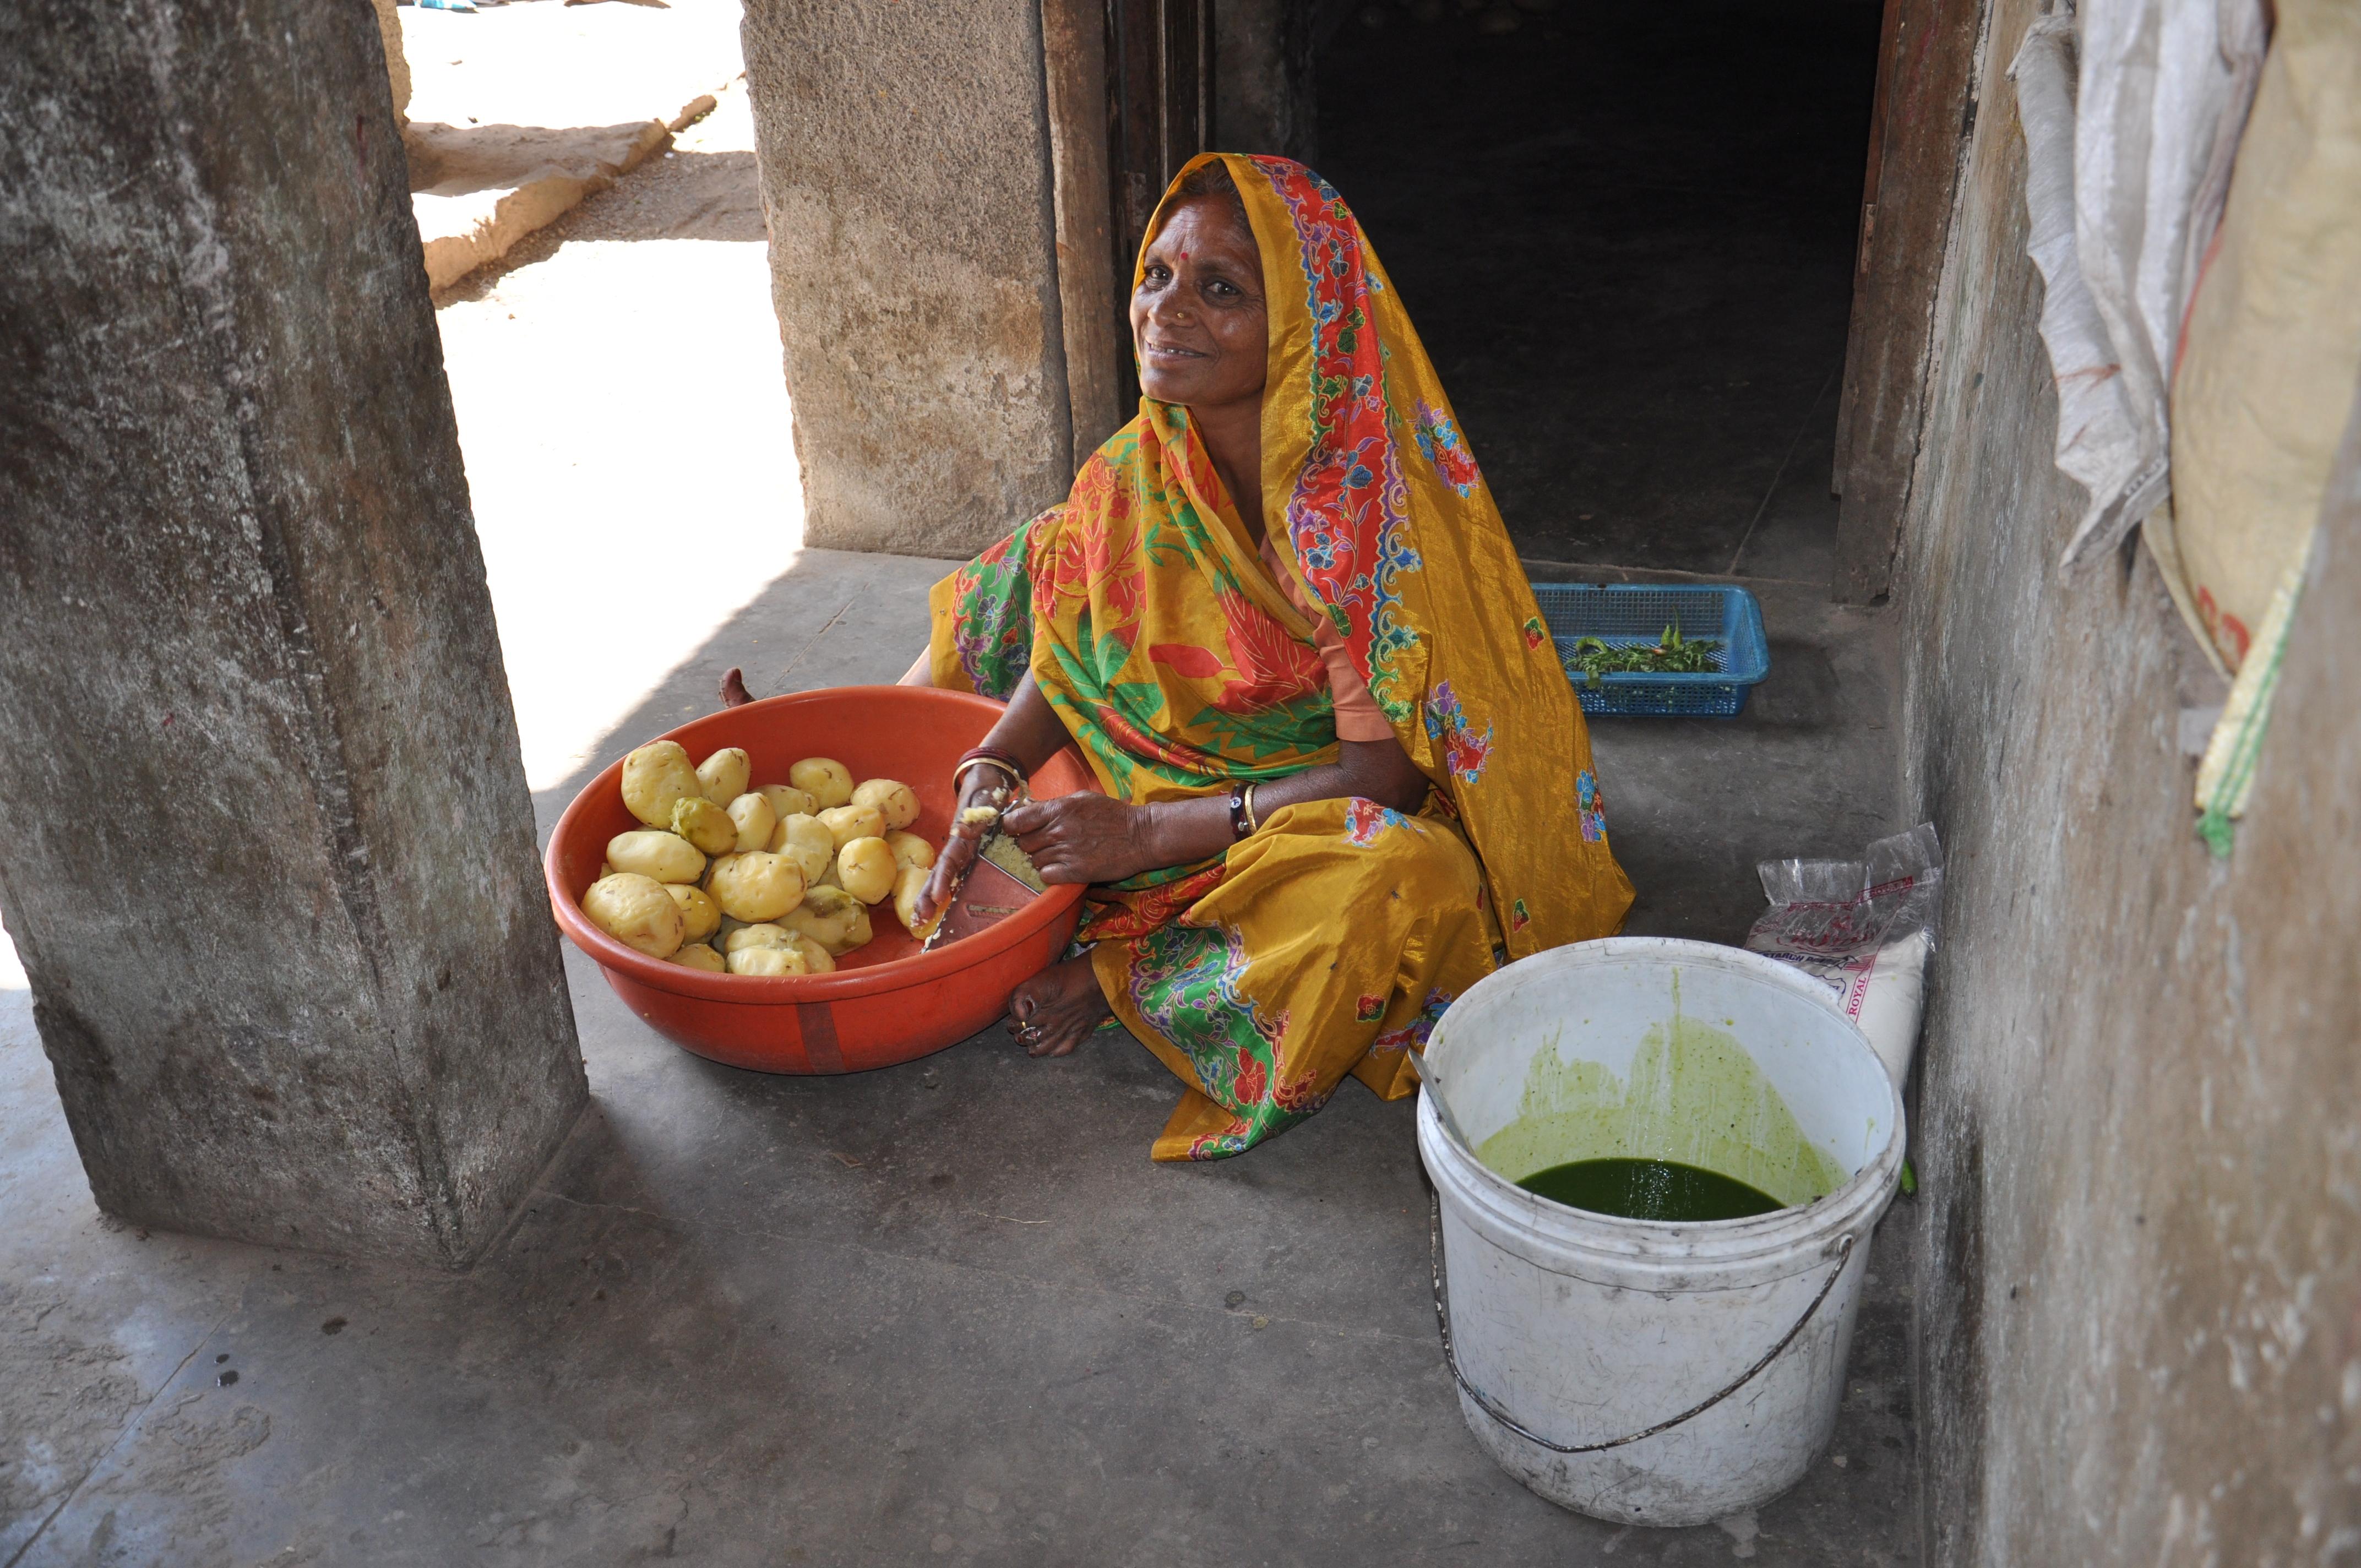 मोदई (59) आलू छिलते हुए